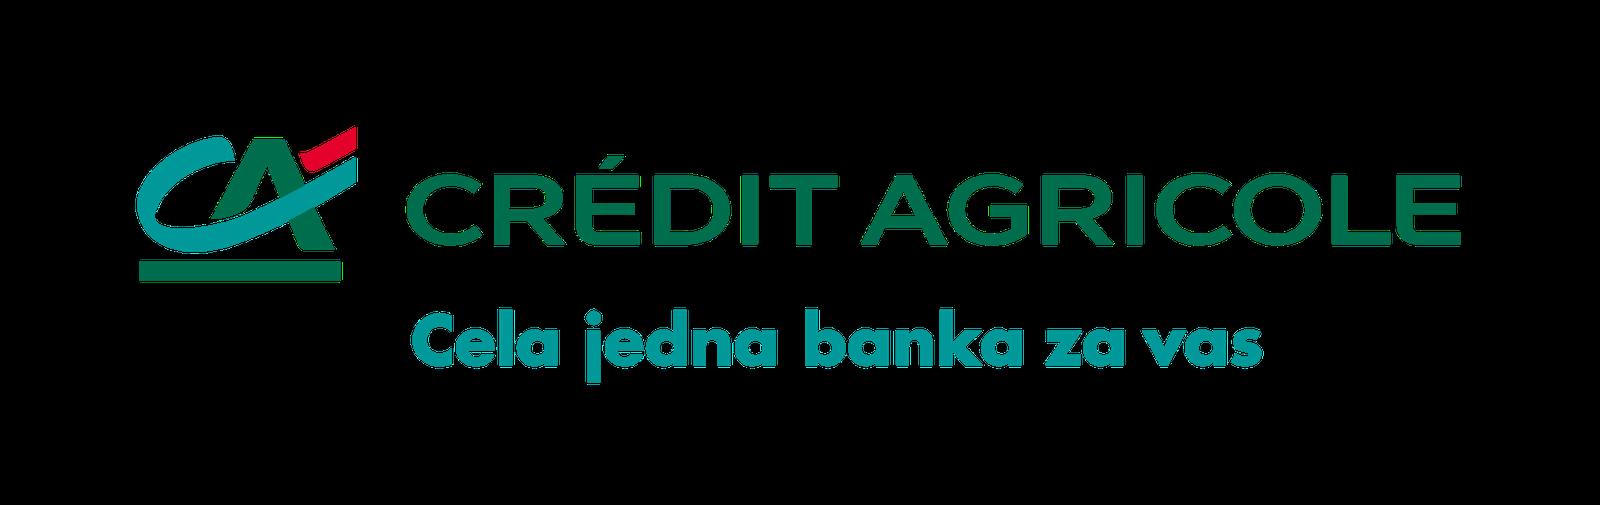 Credit Agricole Srbija-logo